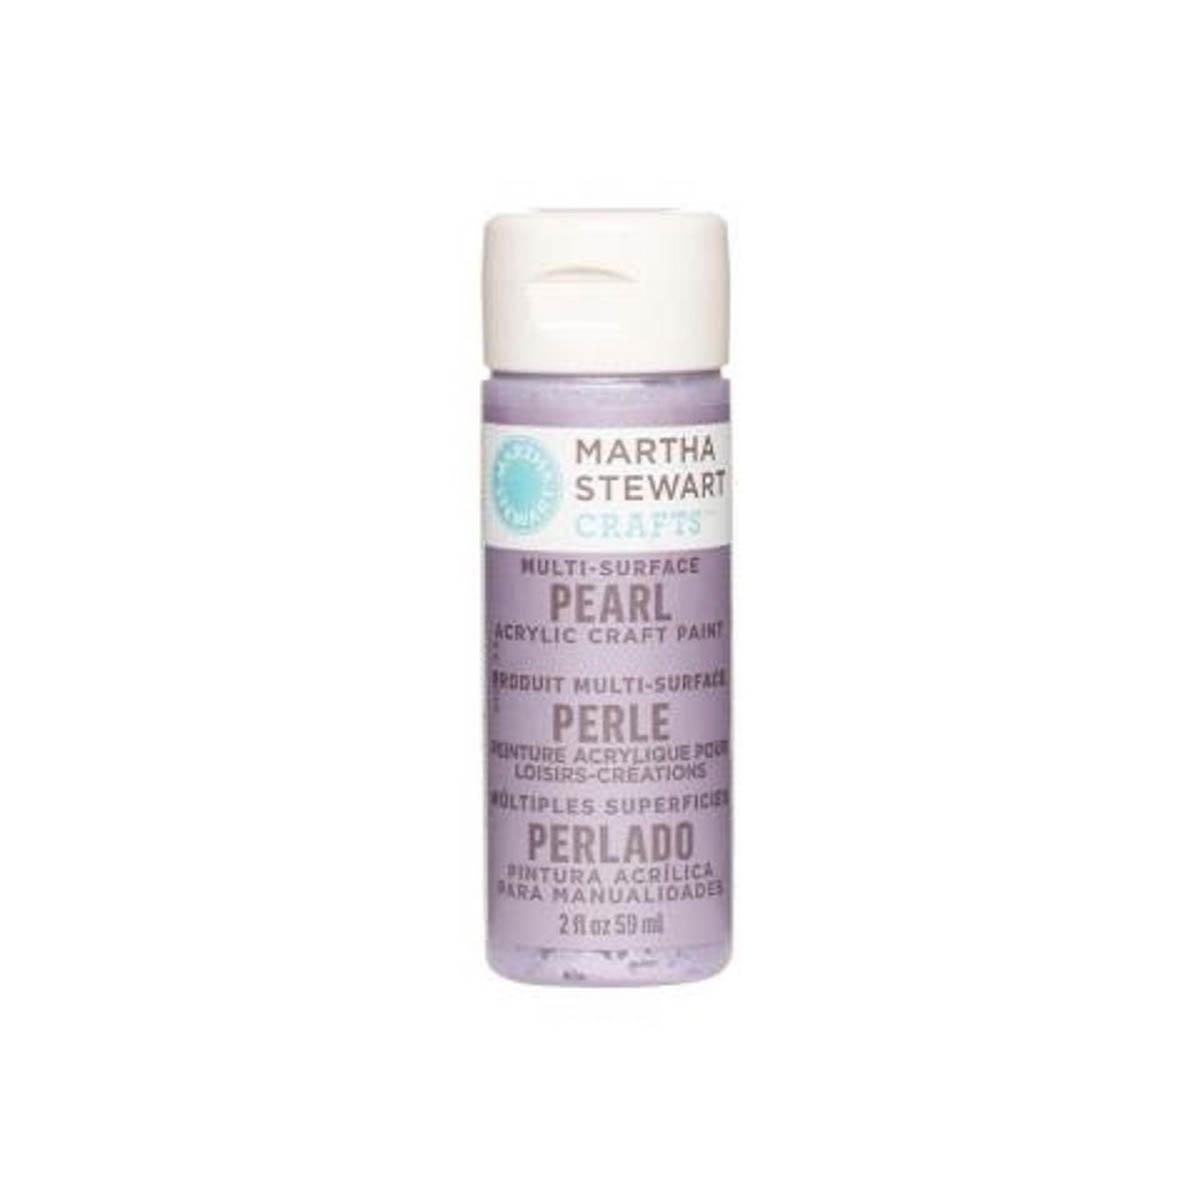 Martha Stewart Crafts ® 2oz Multi-Surface Pearl Acrylic Craft Paint - Eclipse